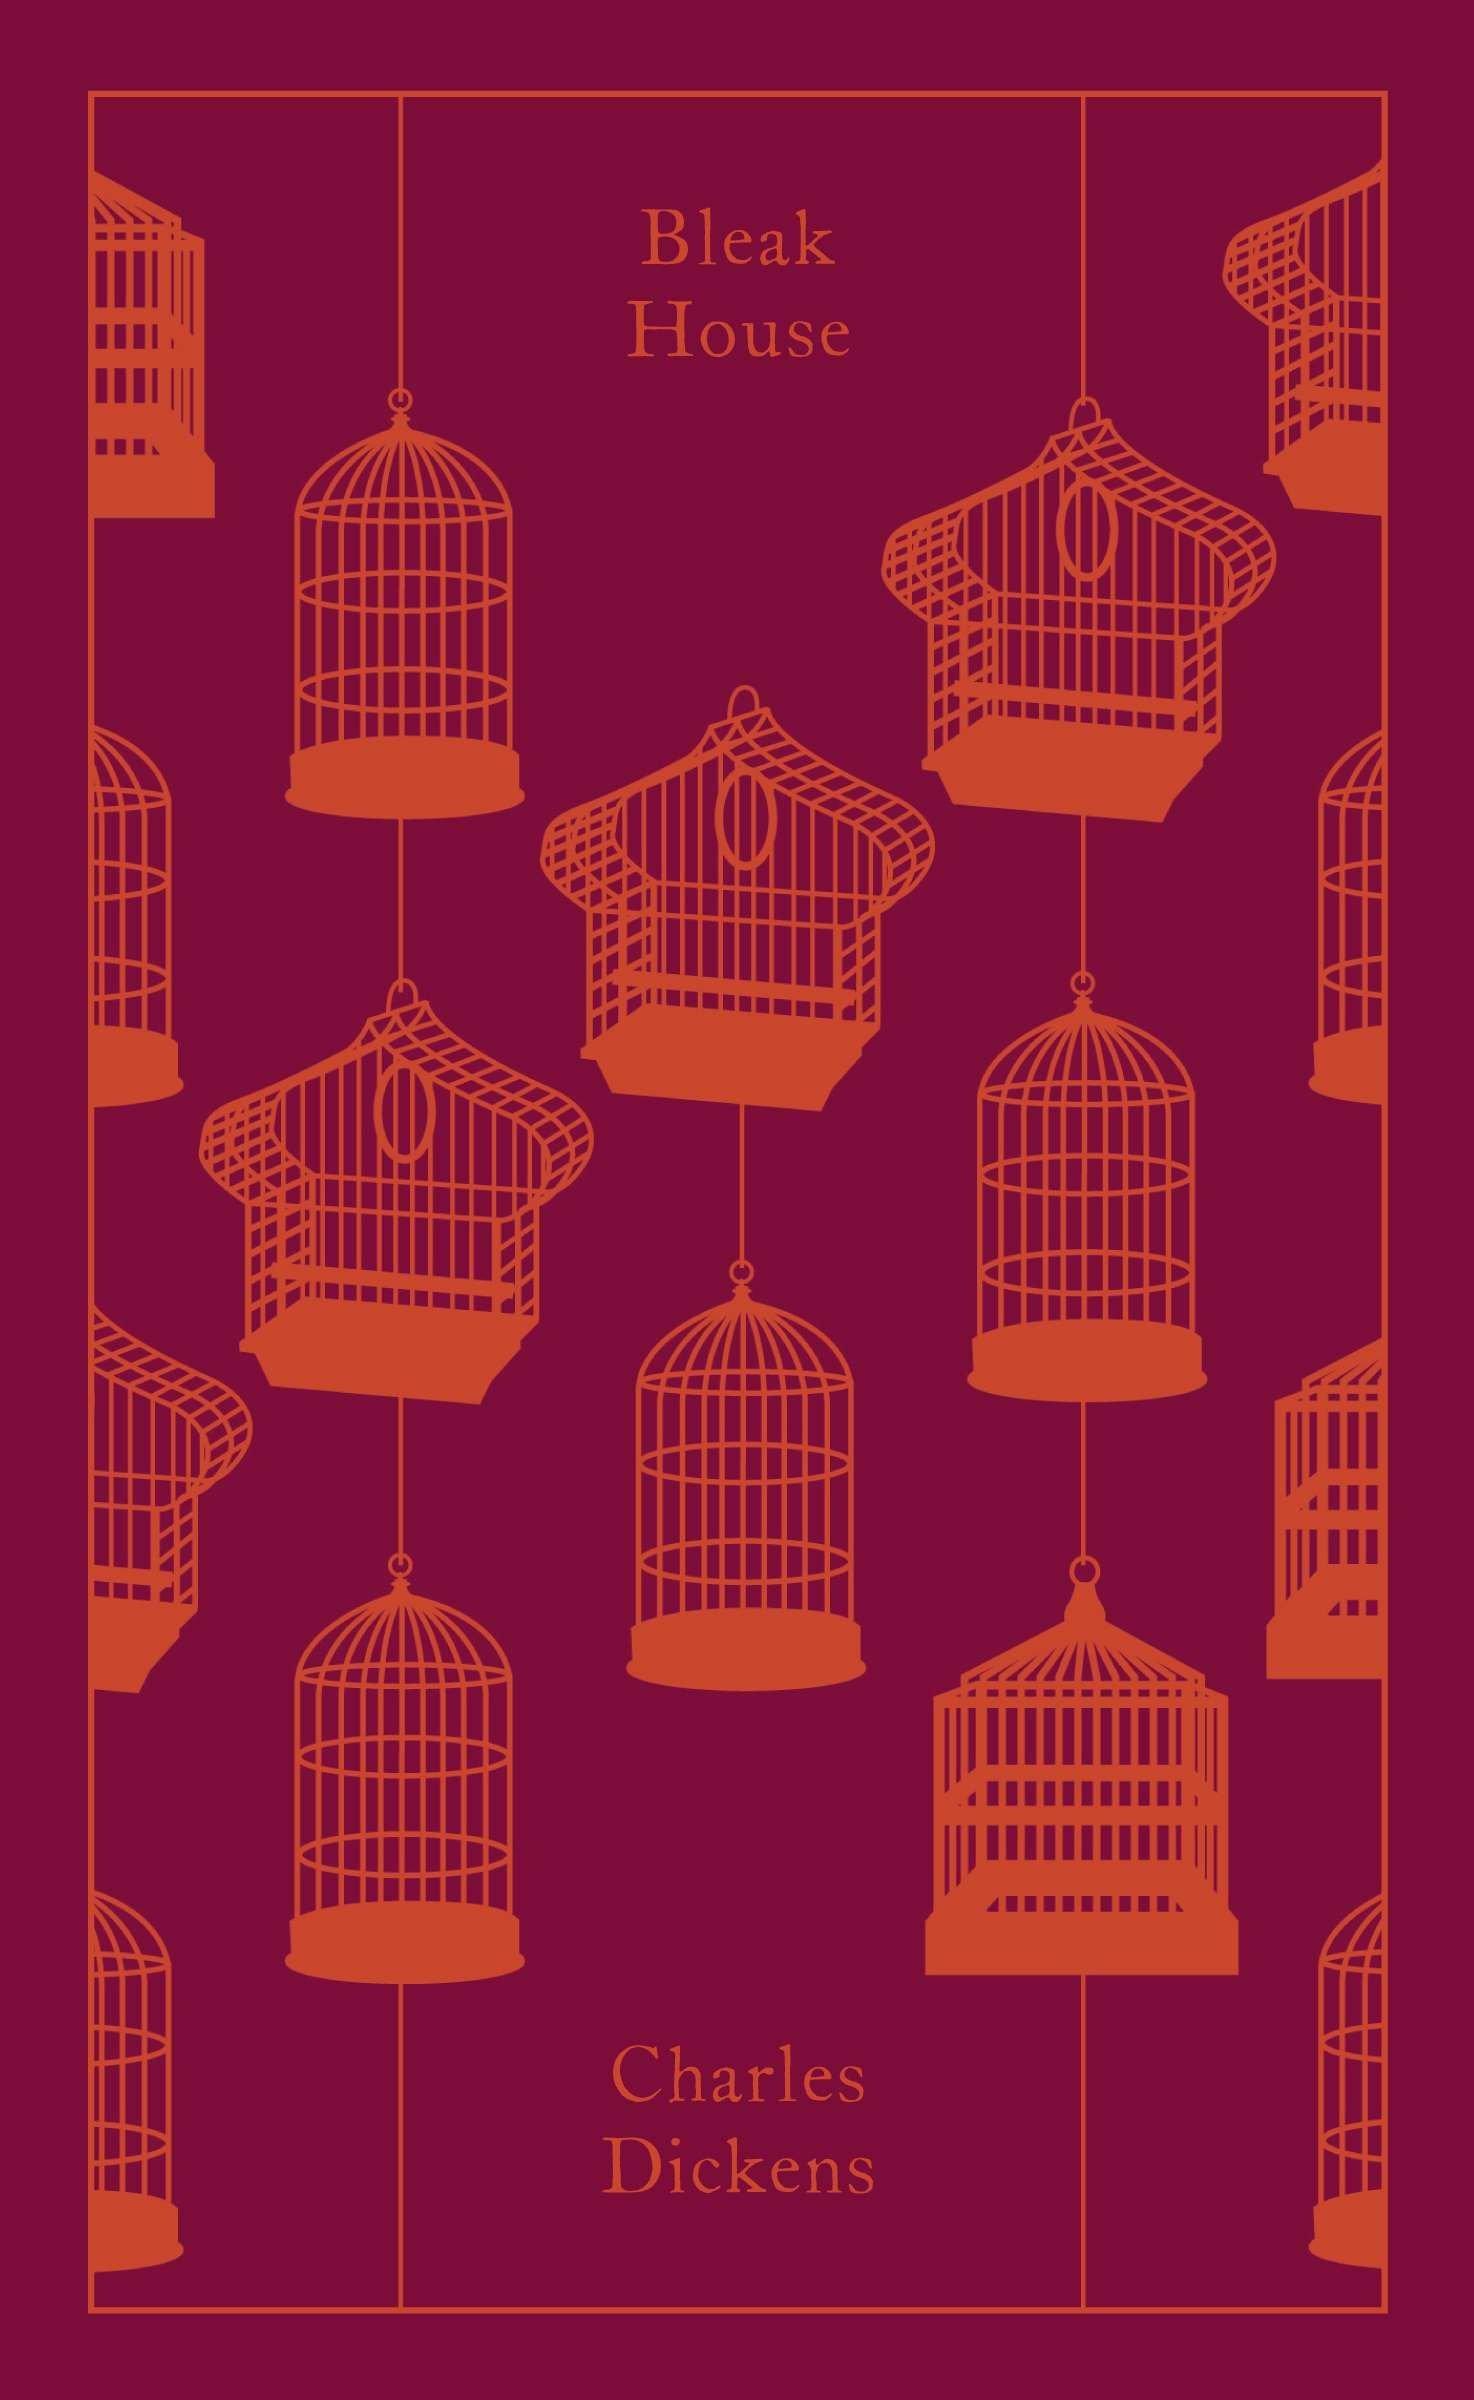 Download Bleak House (Penguin Clothbound Classics) ePub fb2 ebook